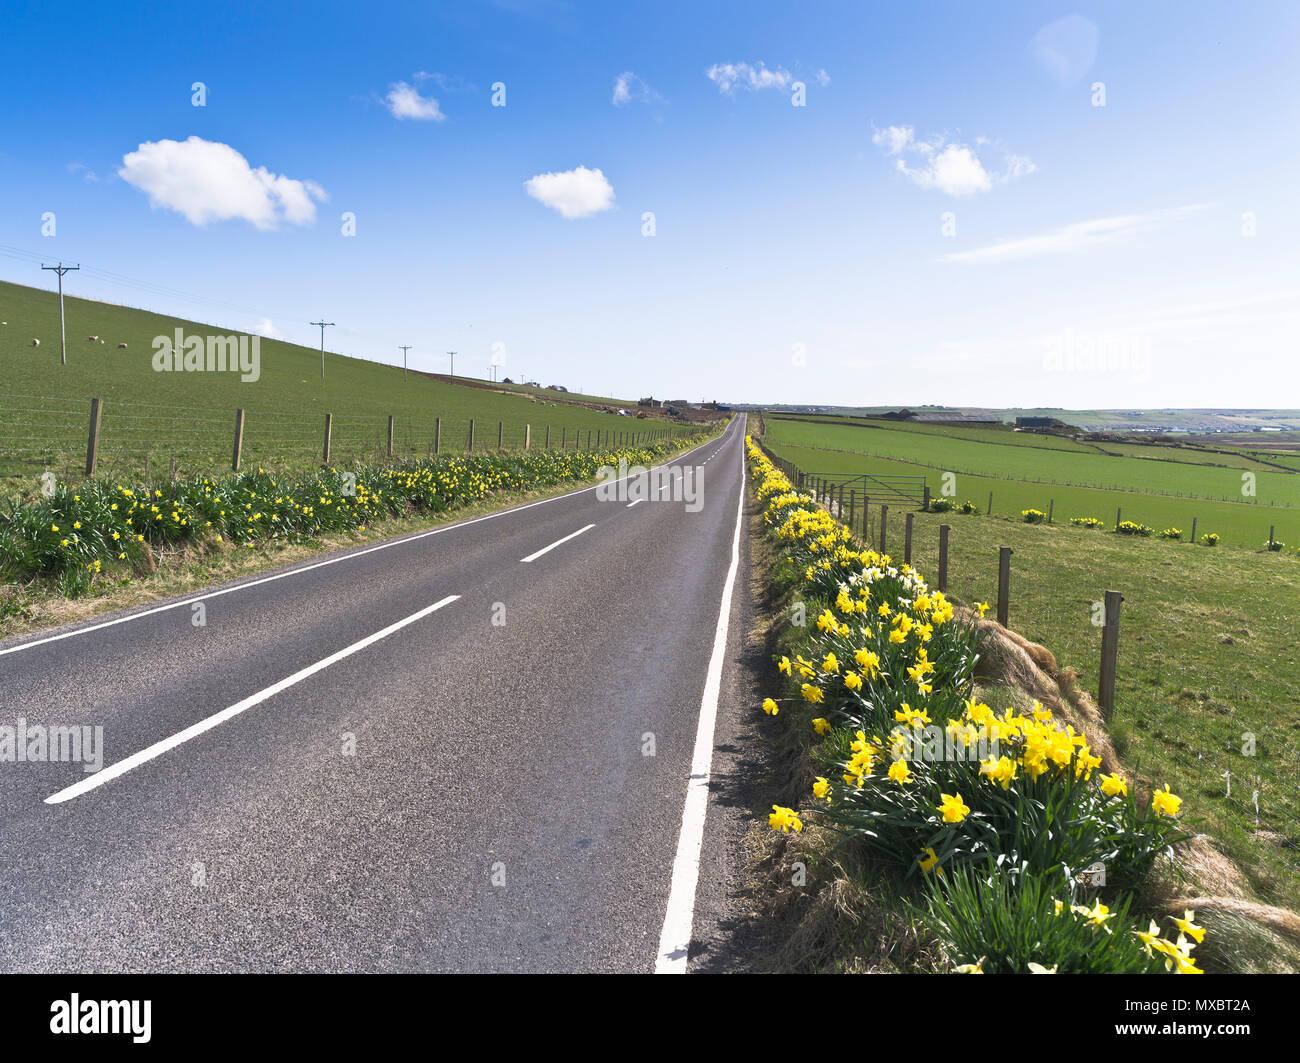 Empty ROAD ORKNEY Scottish isles deserted road daffodils roadside verge flowers scotland - Stock Image